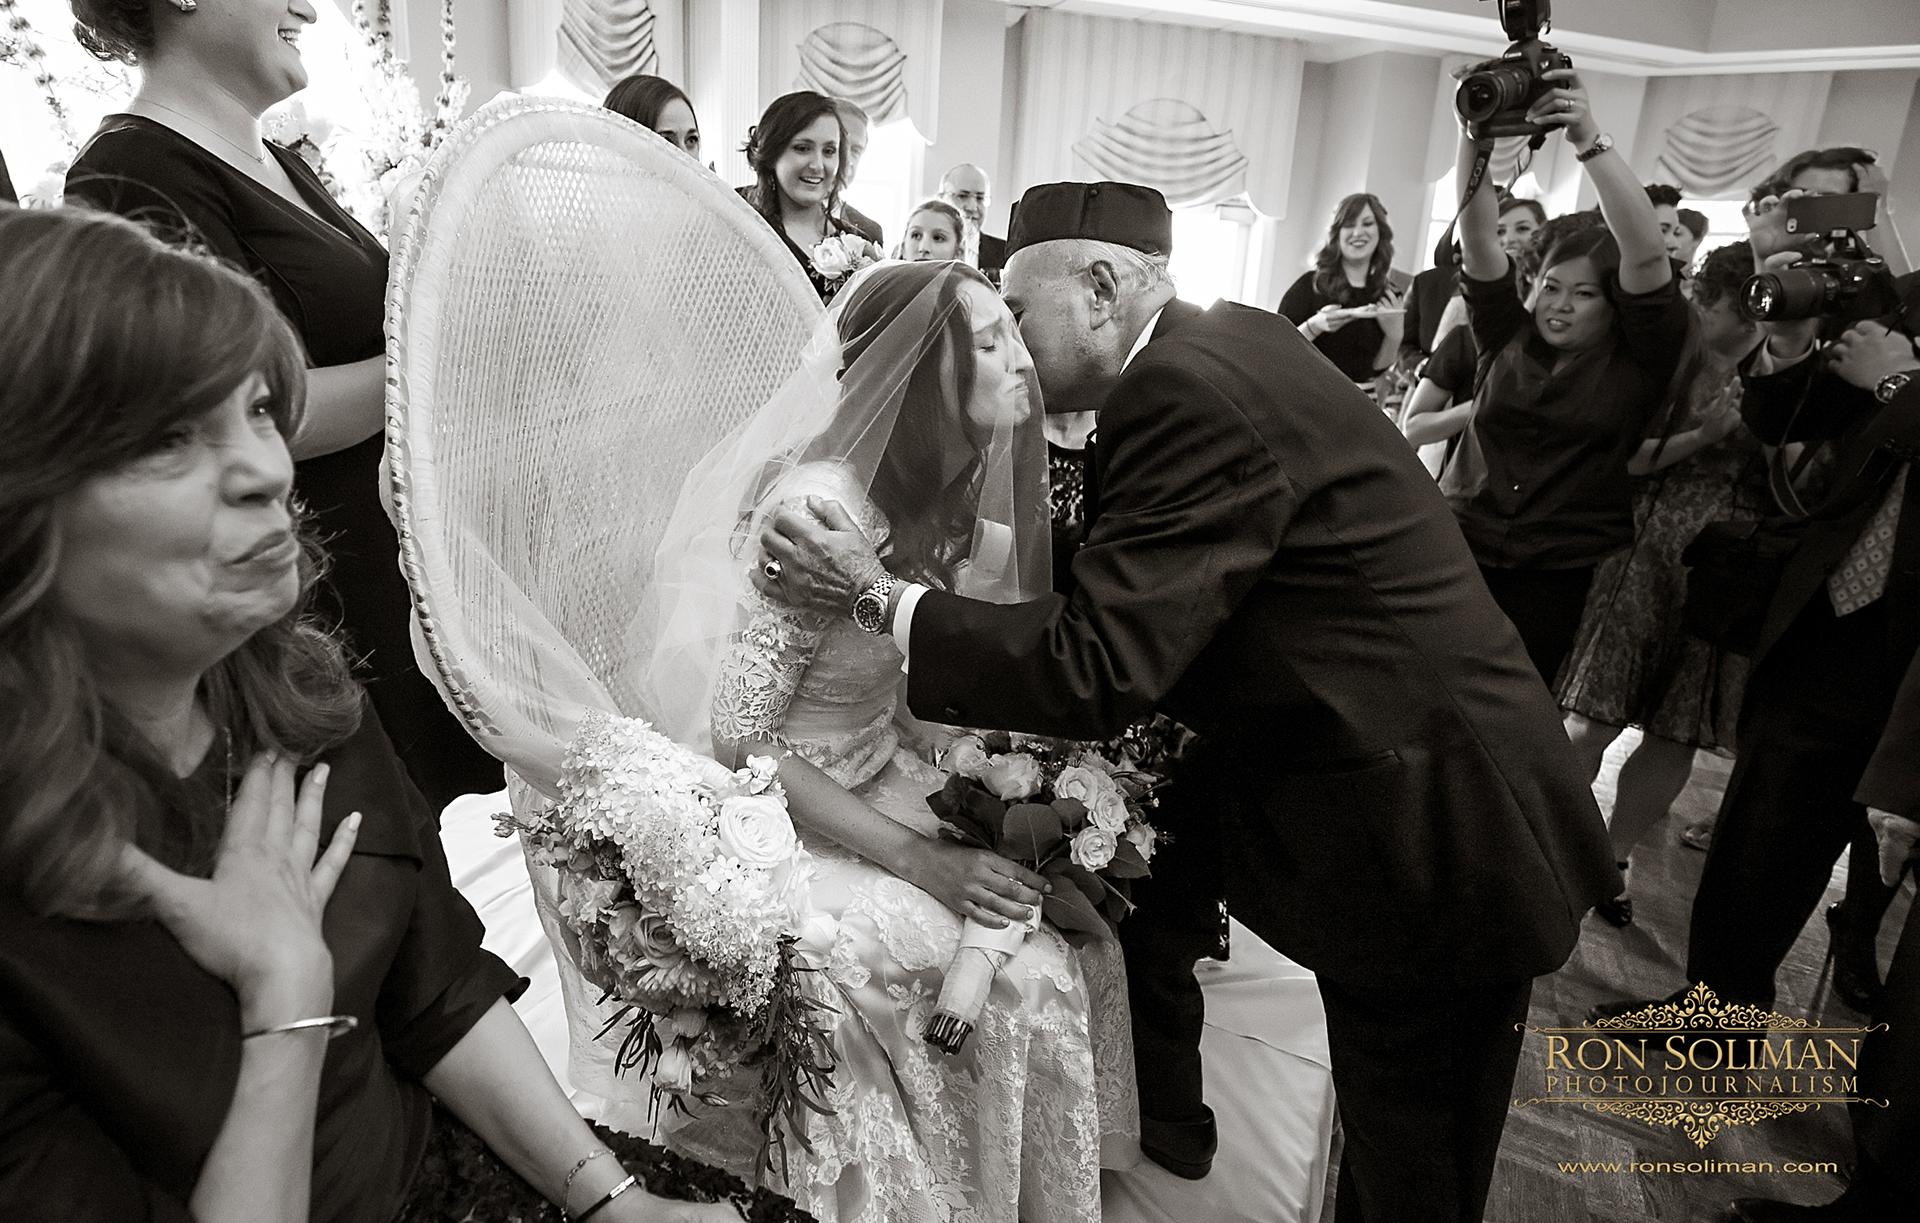 orthodox jewish wedding customs